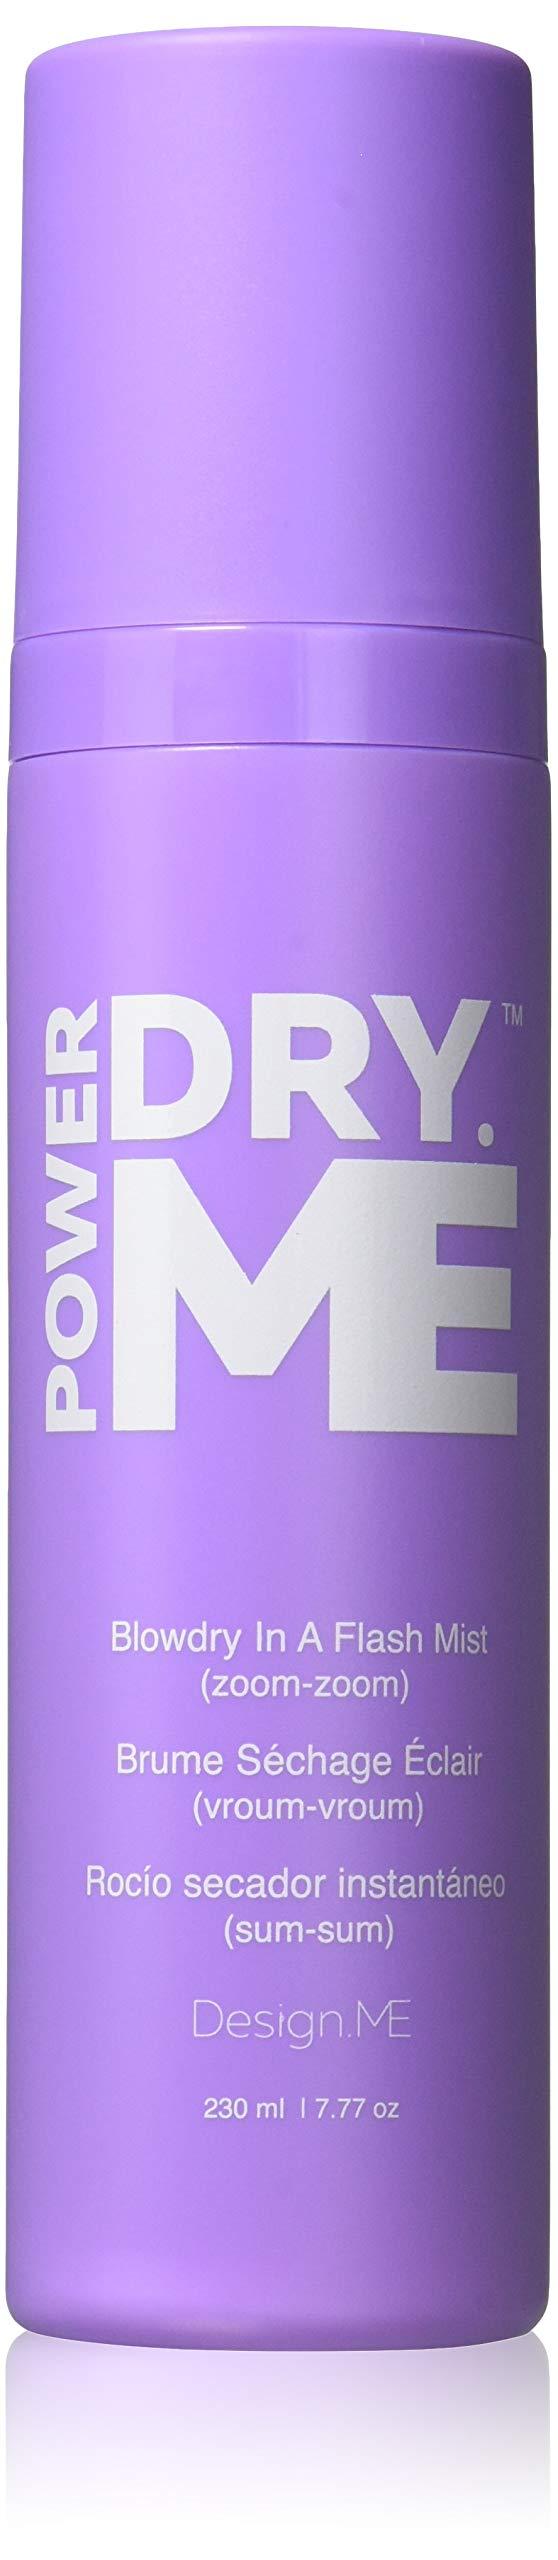 Design.Me Power Dry.Me